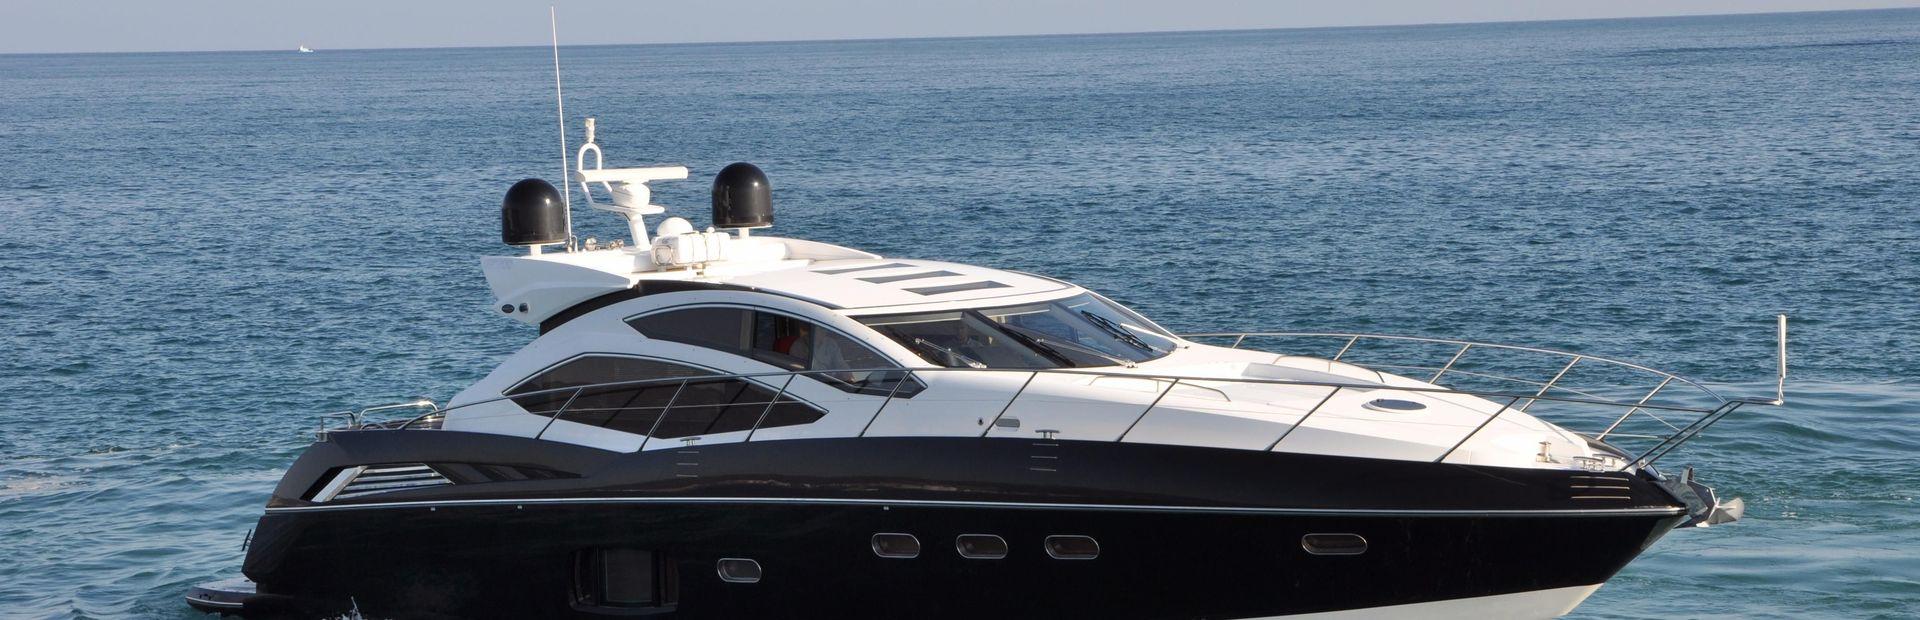 Predator 64 Yacht Charter